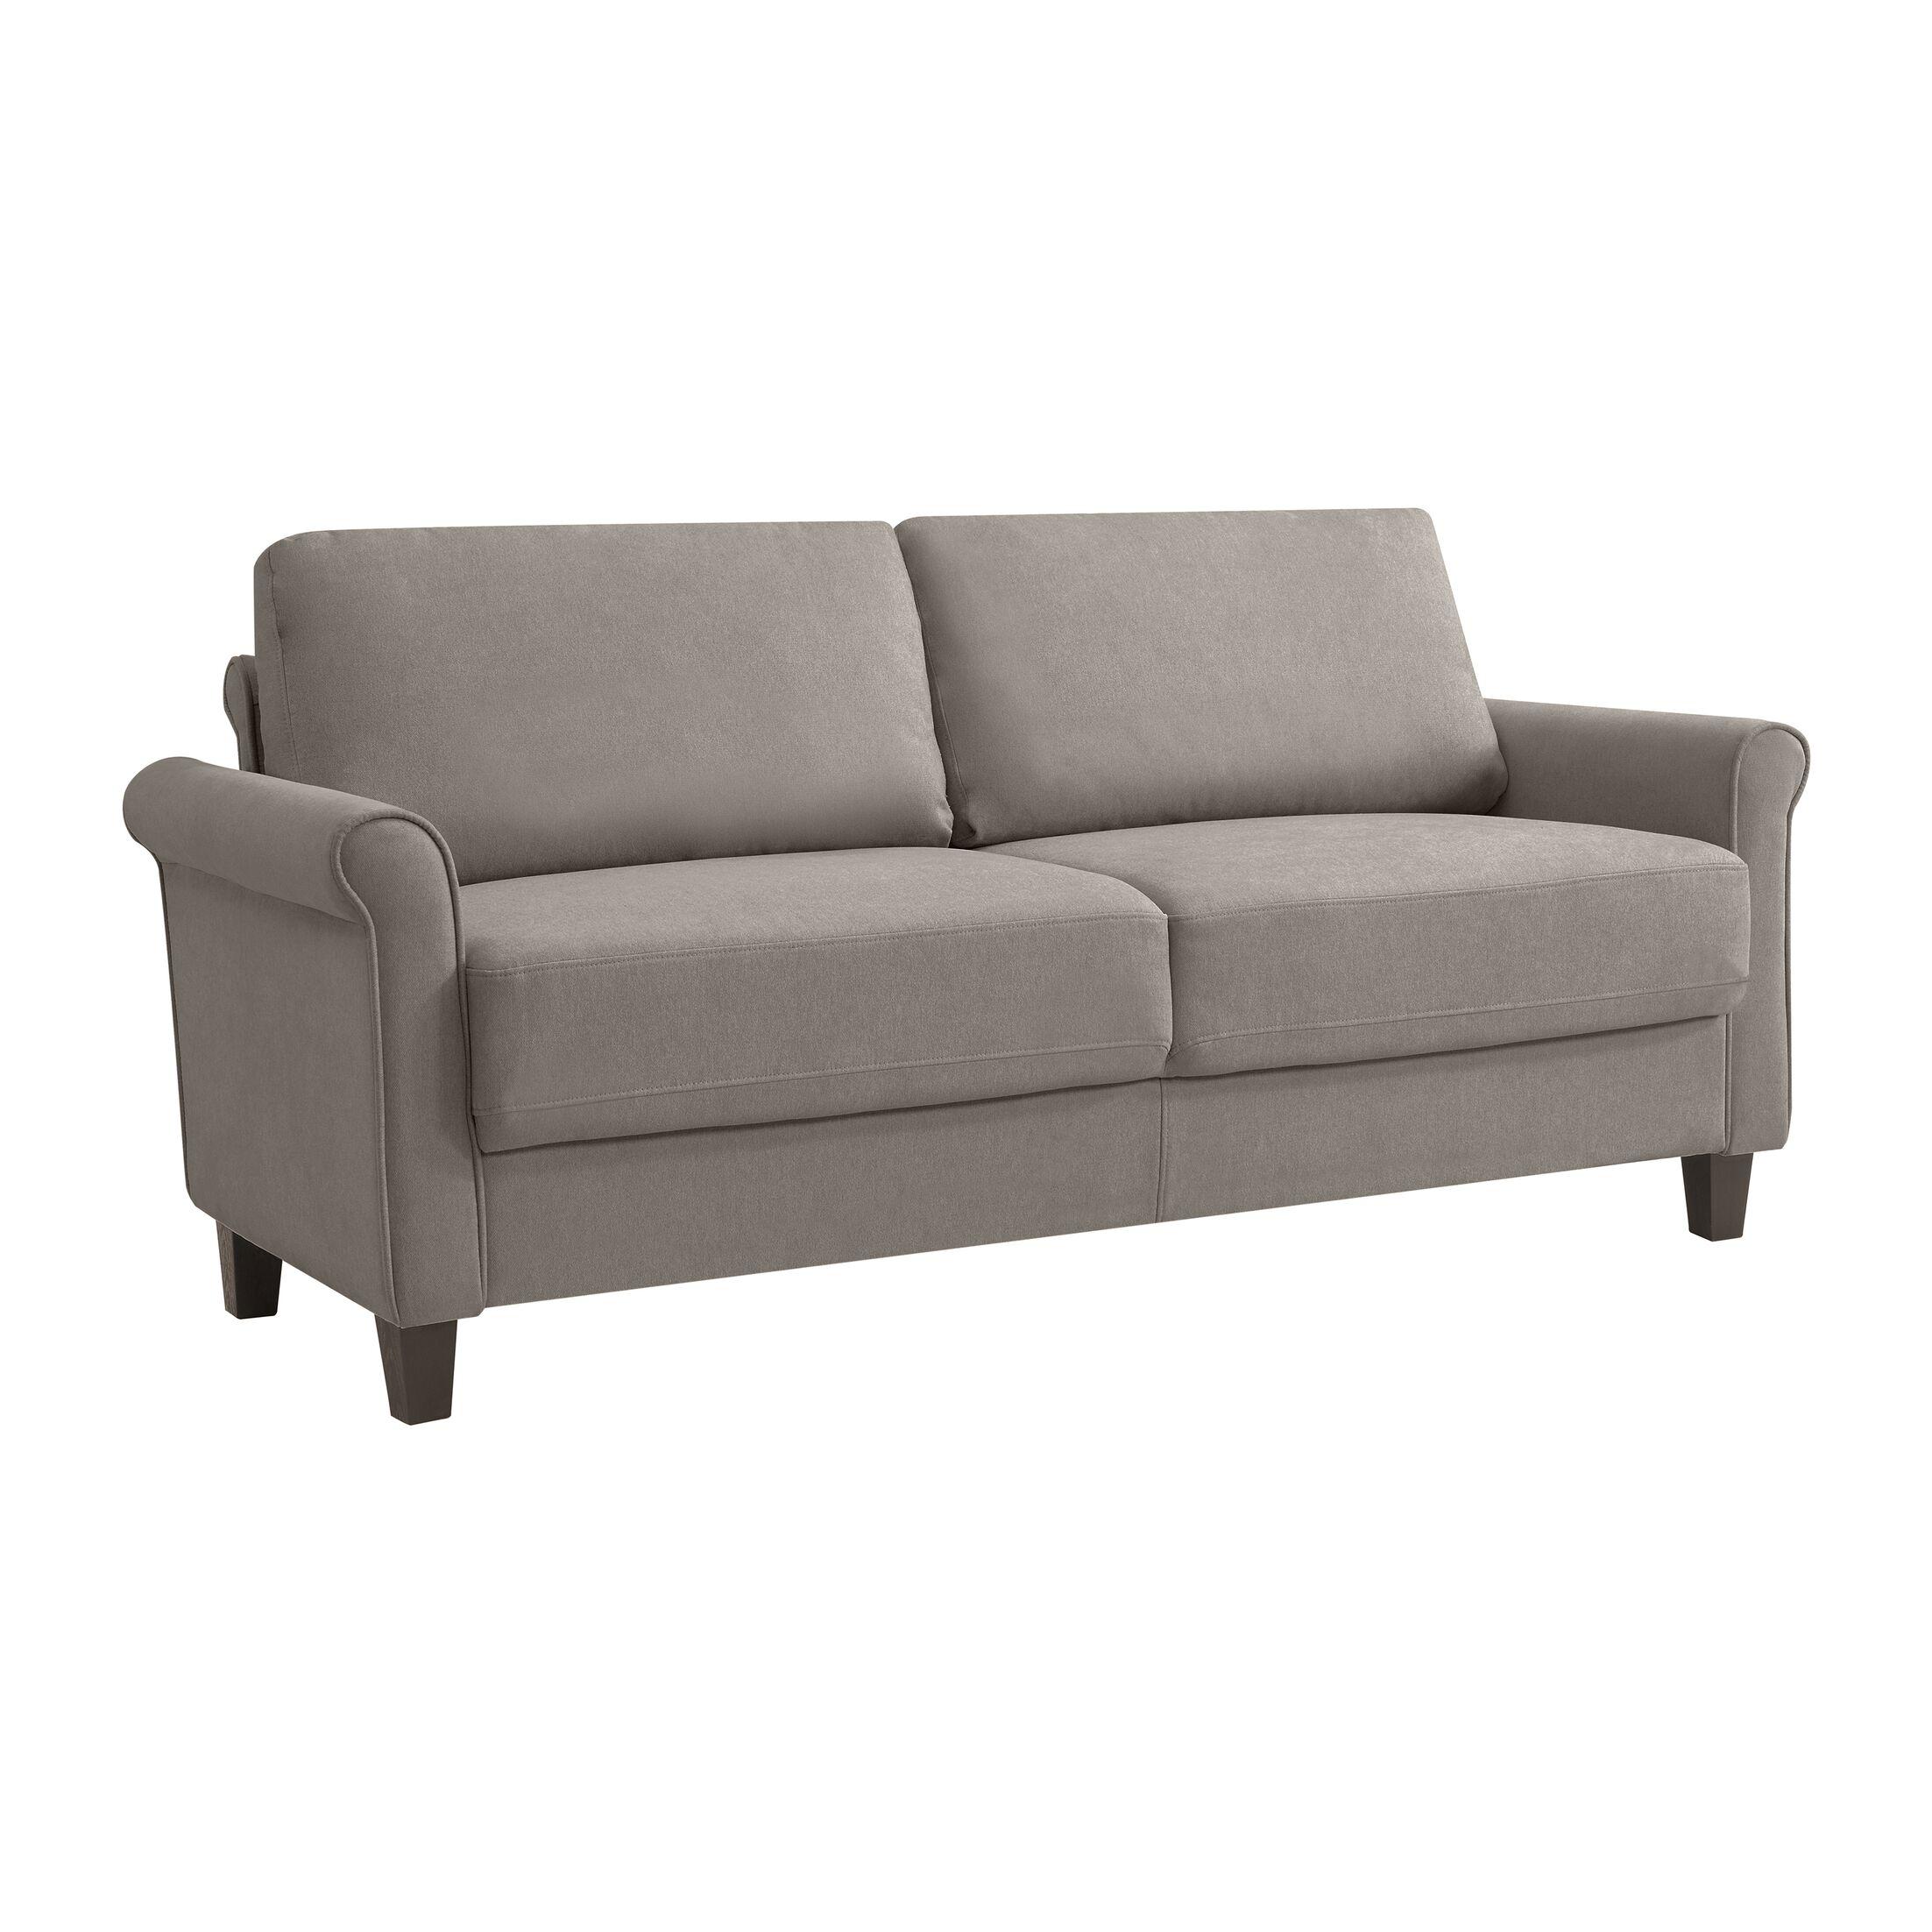 Halesowen Sofa Upholstery: Smoky Gray